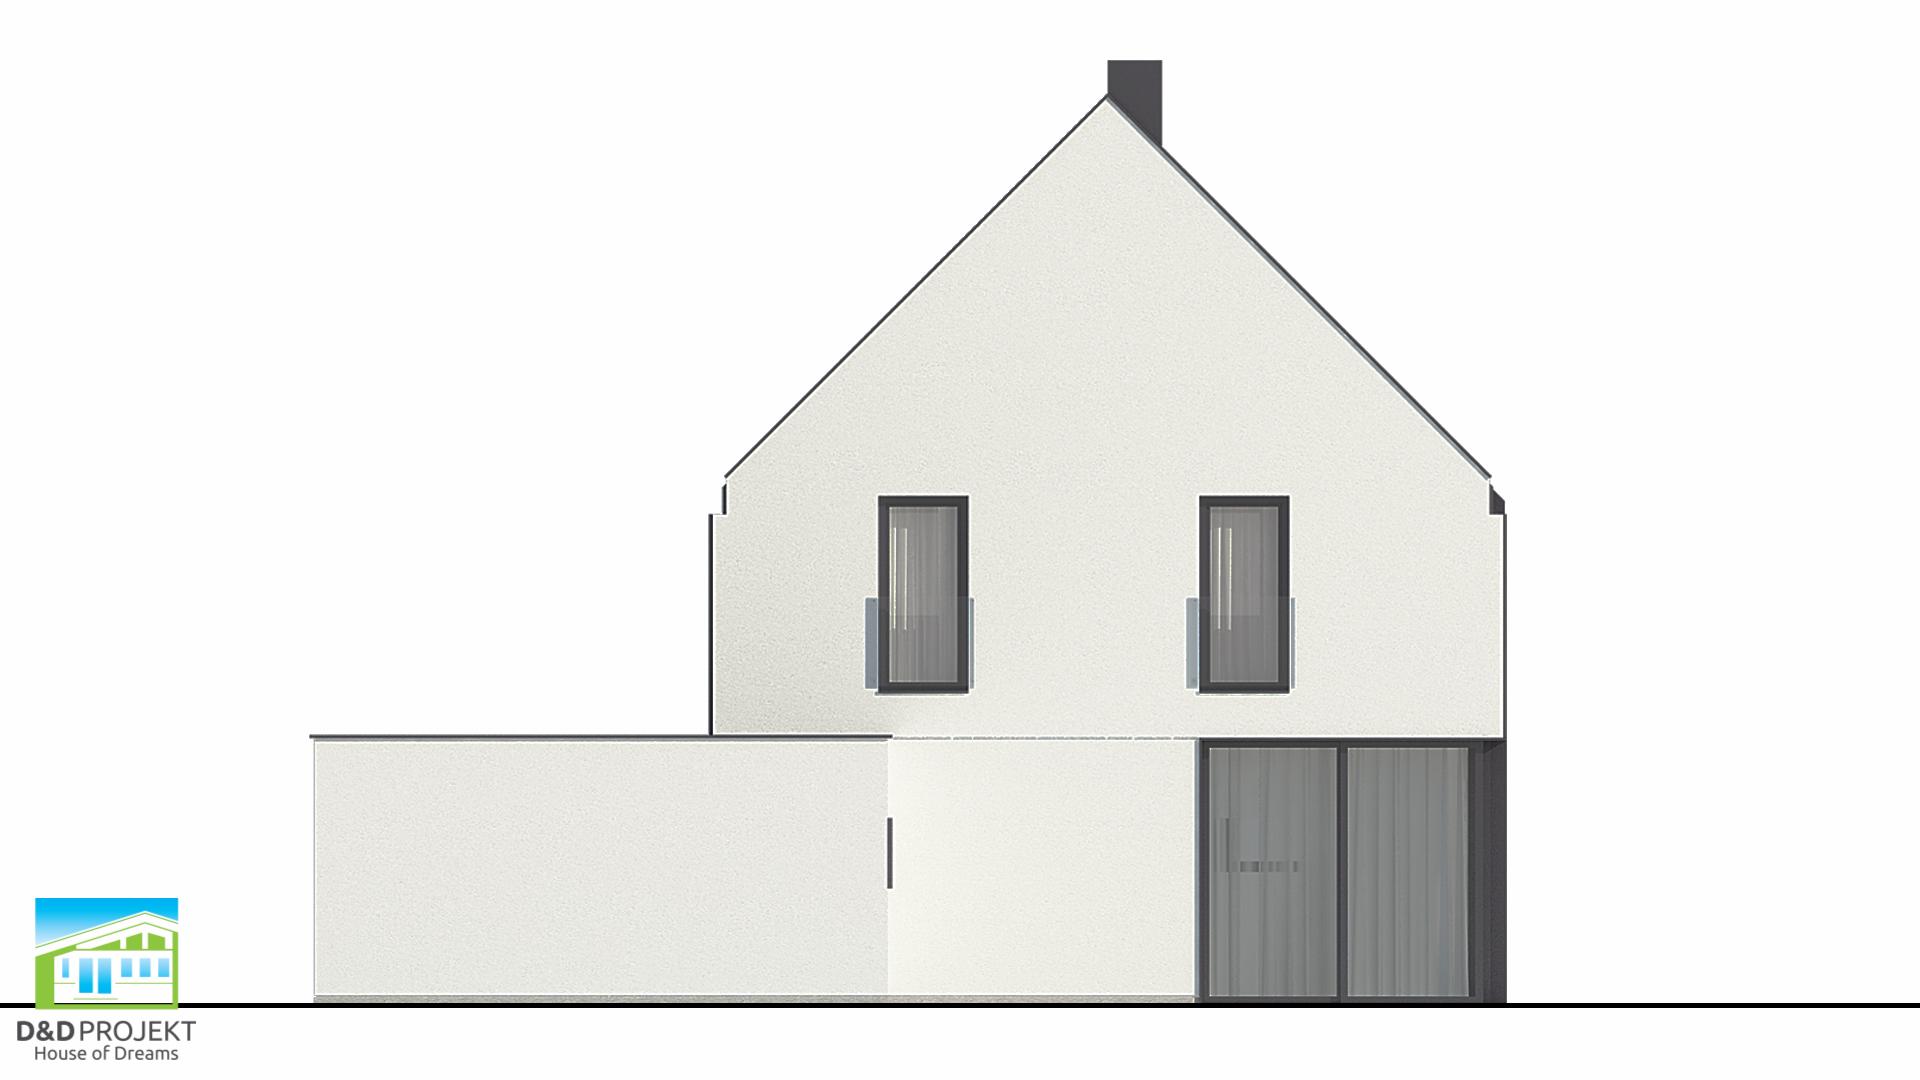 https://ddprojekt.pl/wp-content/uploads/2020/03/elewacja2-7.jpg